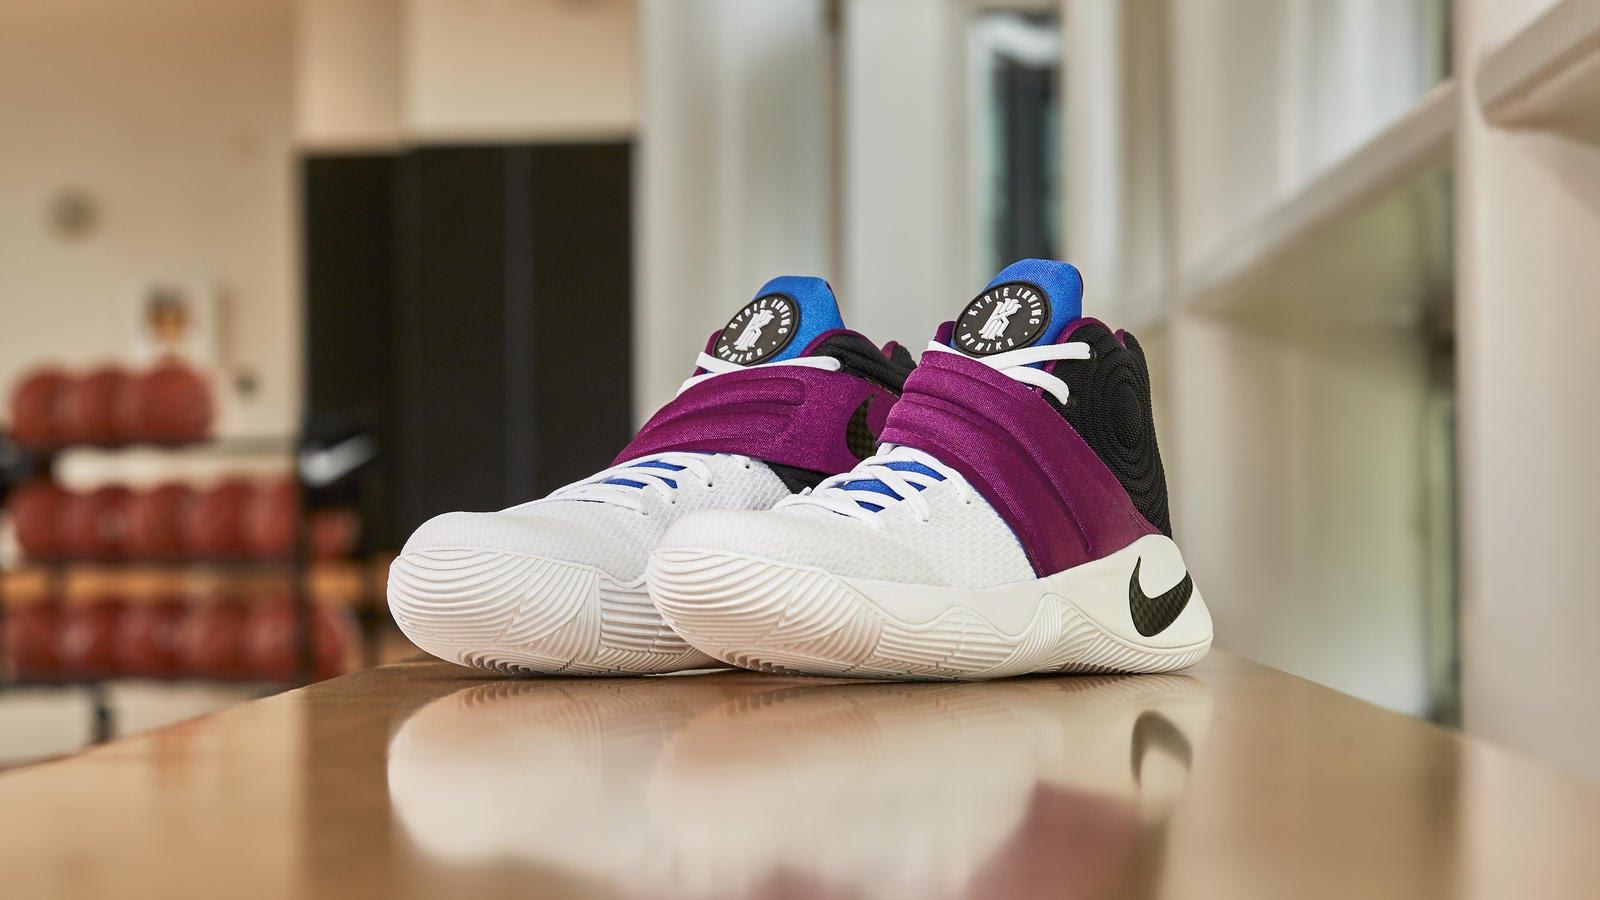 brand new 917b7 94950 The Nike Kyrie 2 Kyrache Is A Tribute To An Iconic Nike Sneaker (Video) •  KicksOnFire.com